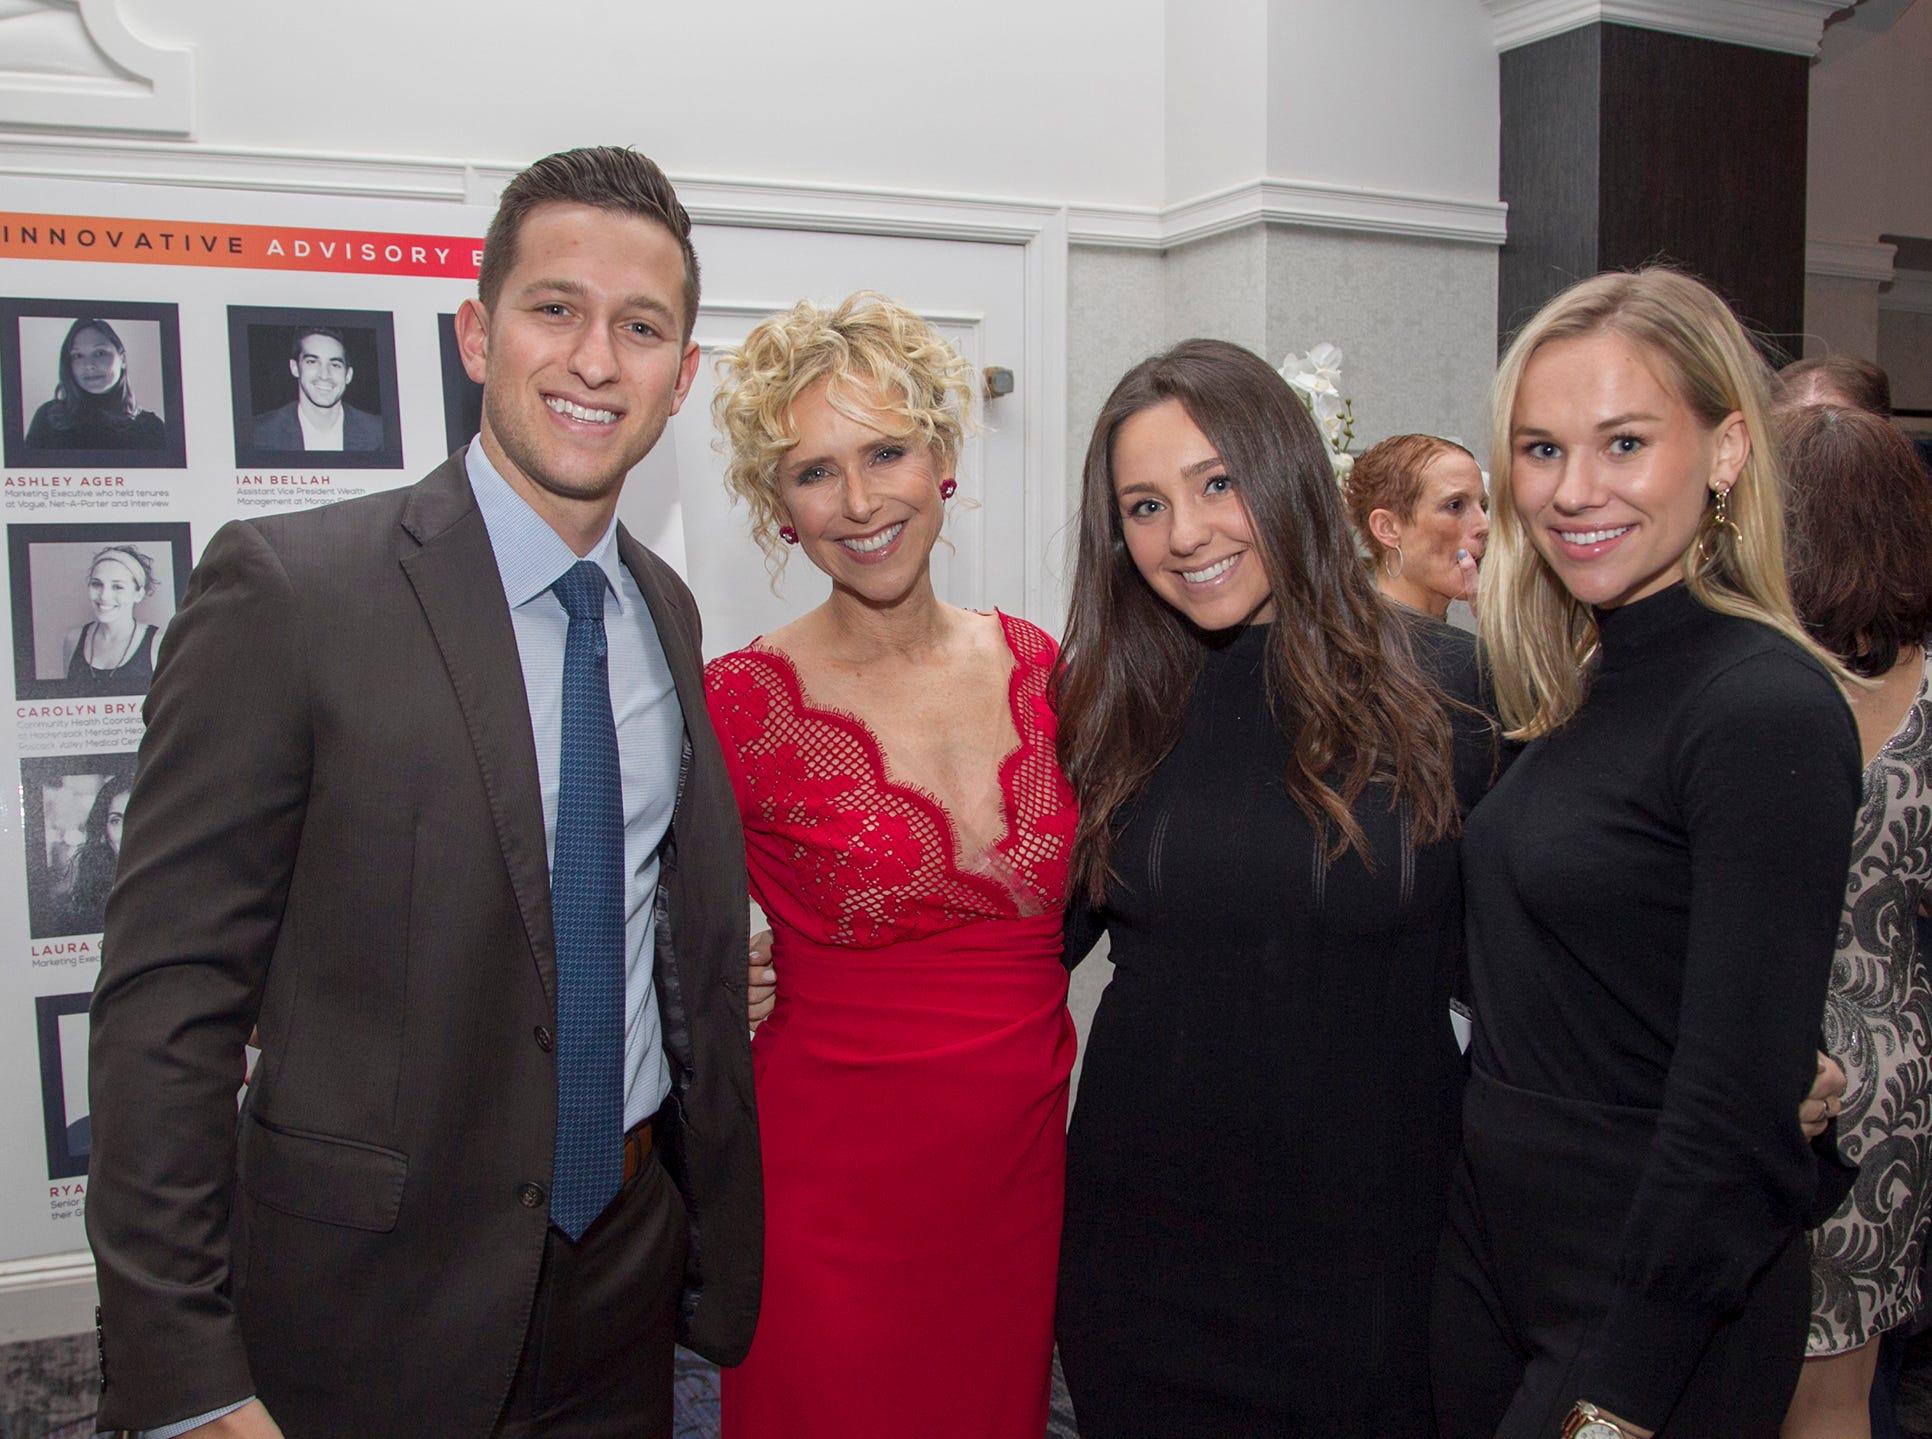 Jacon Topfer, Geri Topfer, Sydney Topfer, Jessica Stesanowicz. Kula for Karma's 11th Anniversary gala at Pearl River Hilton. 11/05/2018